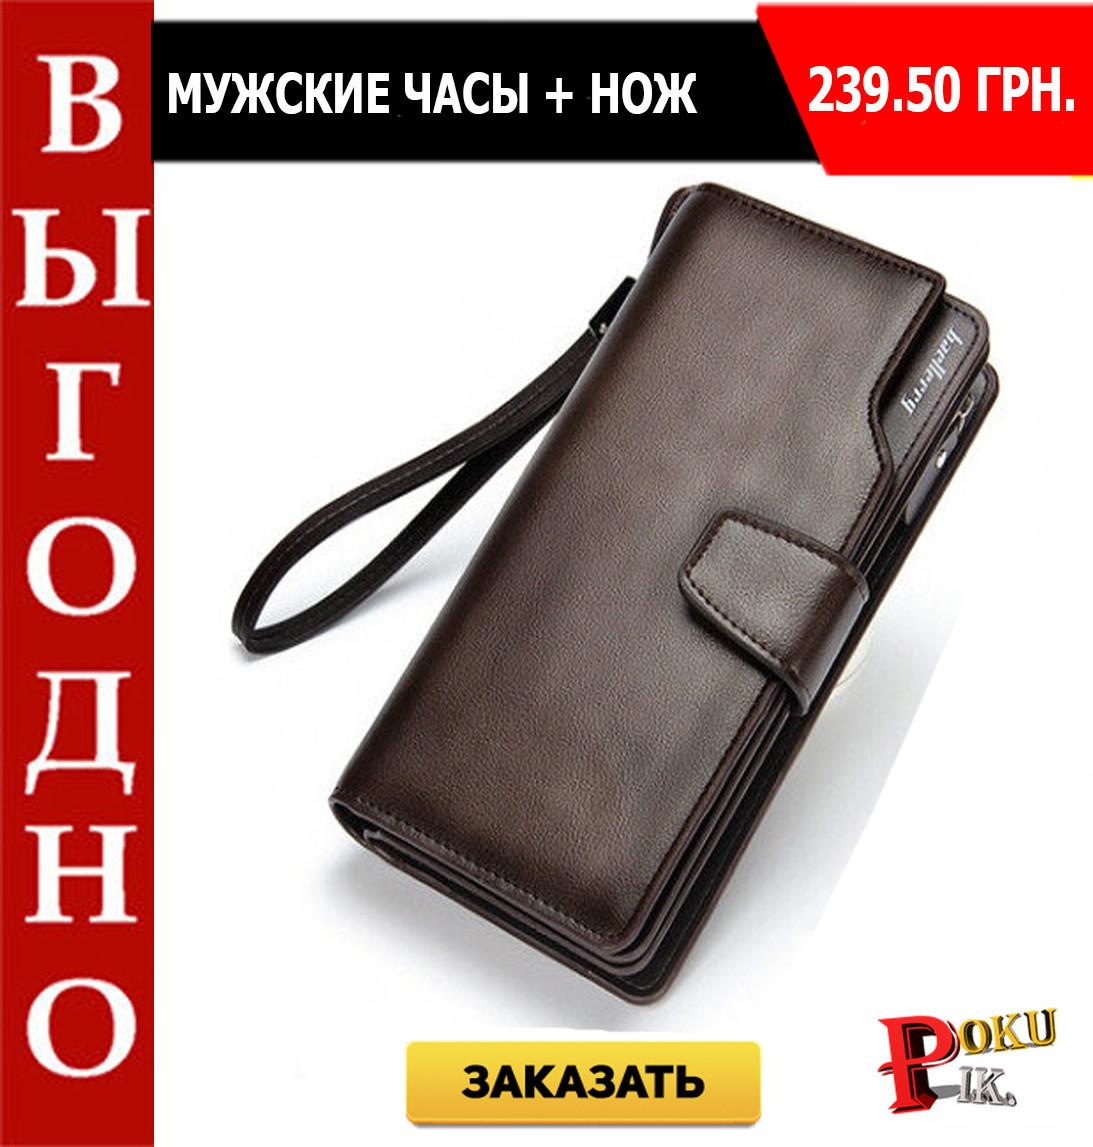 8efdbdc7446b Мужской кошелек Baellery Business 21: продажа, цена в Львове ...